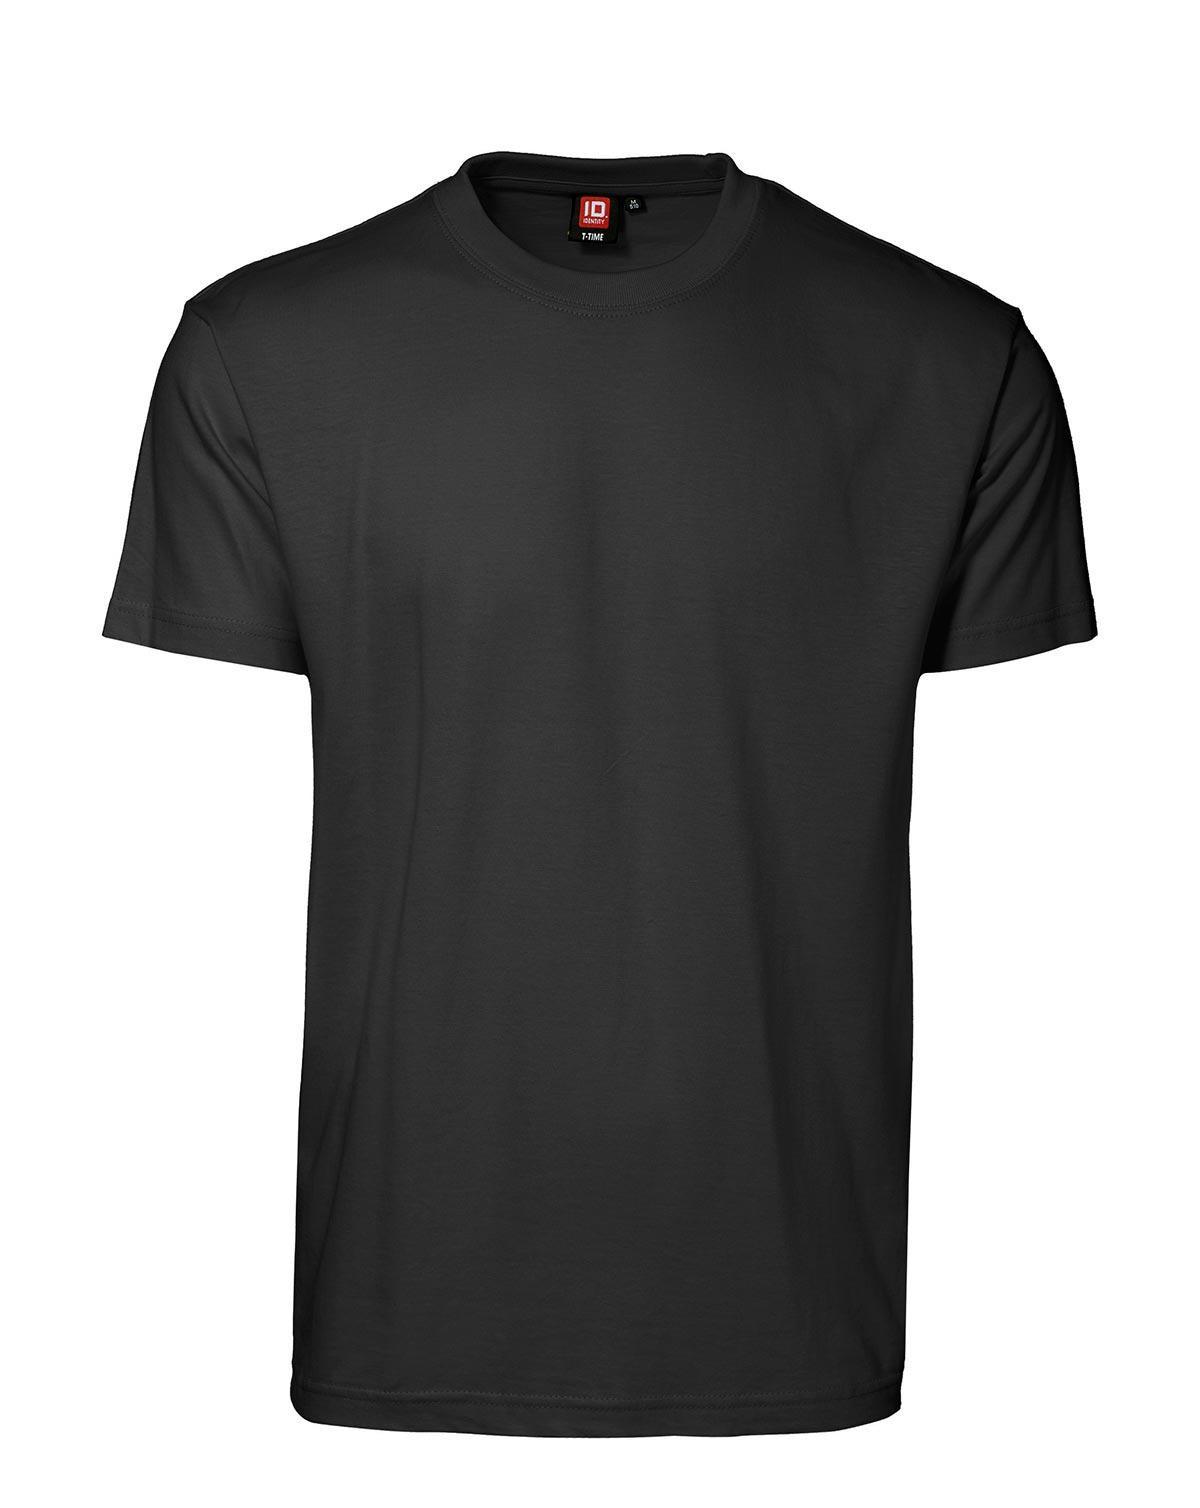 ID T-Time T-shirt, rund hals (Sort, 5XL)